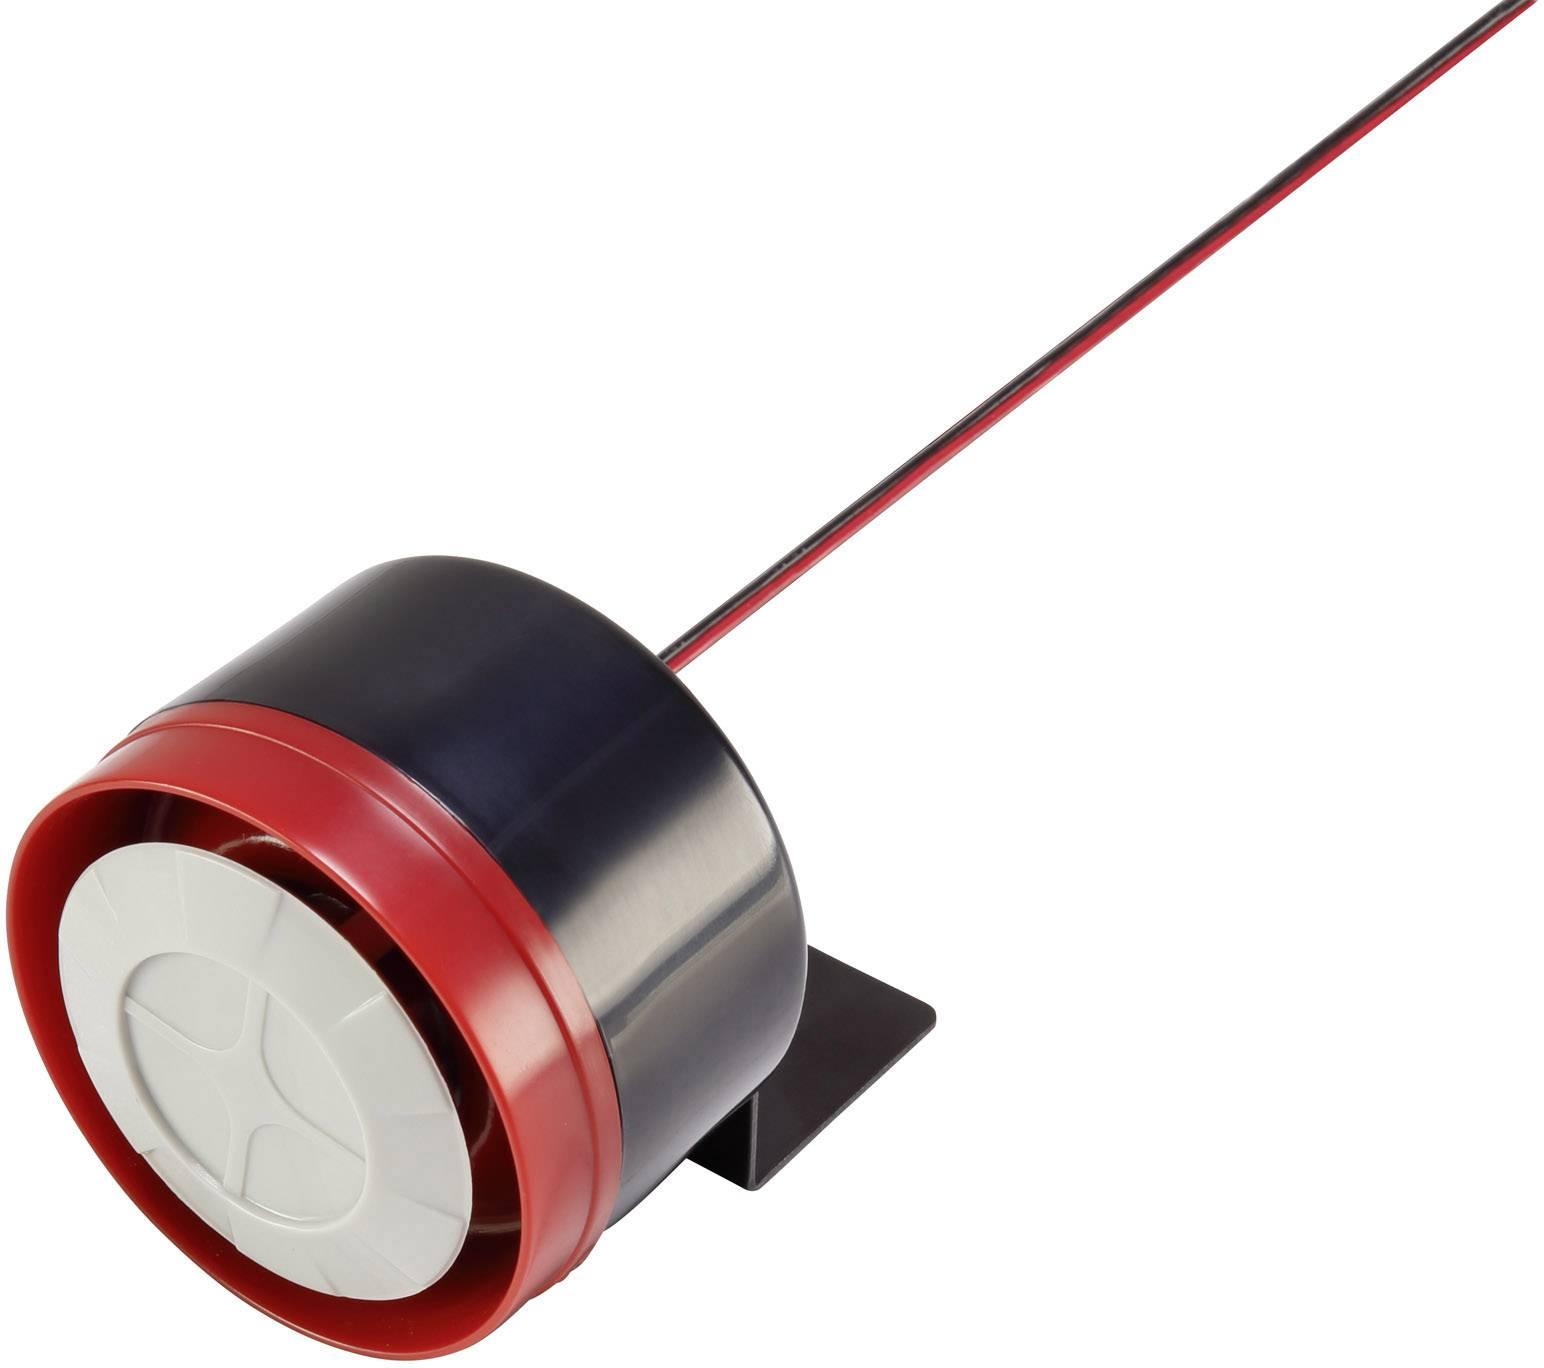 Cat5e Orange Ethernet Patch Cable Sonovin Snagless//Molded Boot 1.5 Foot Color:Orange Pack of 10